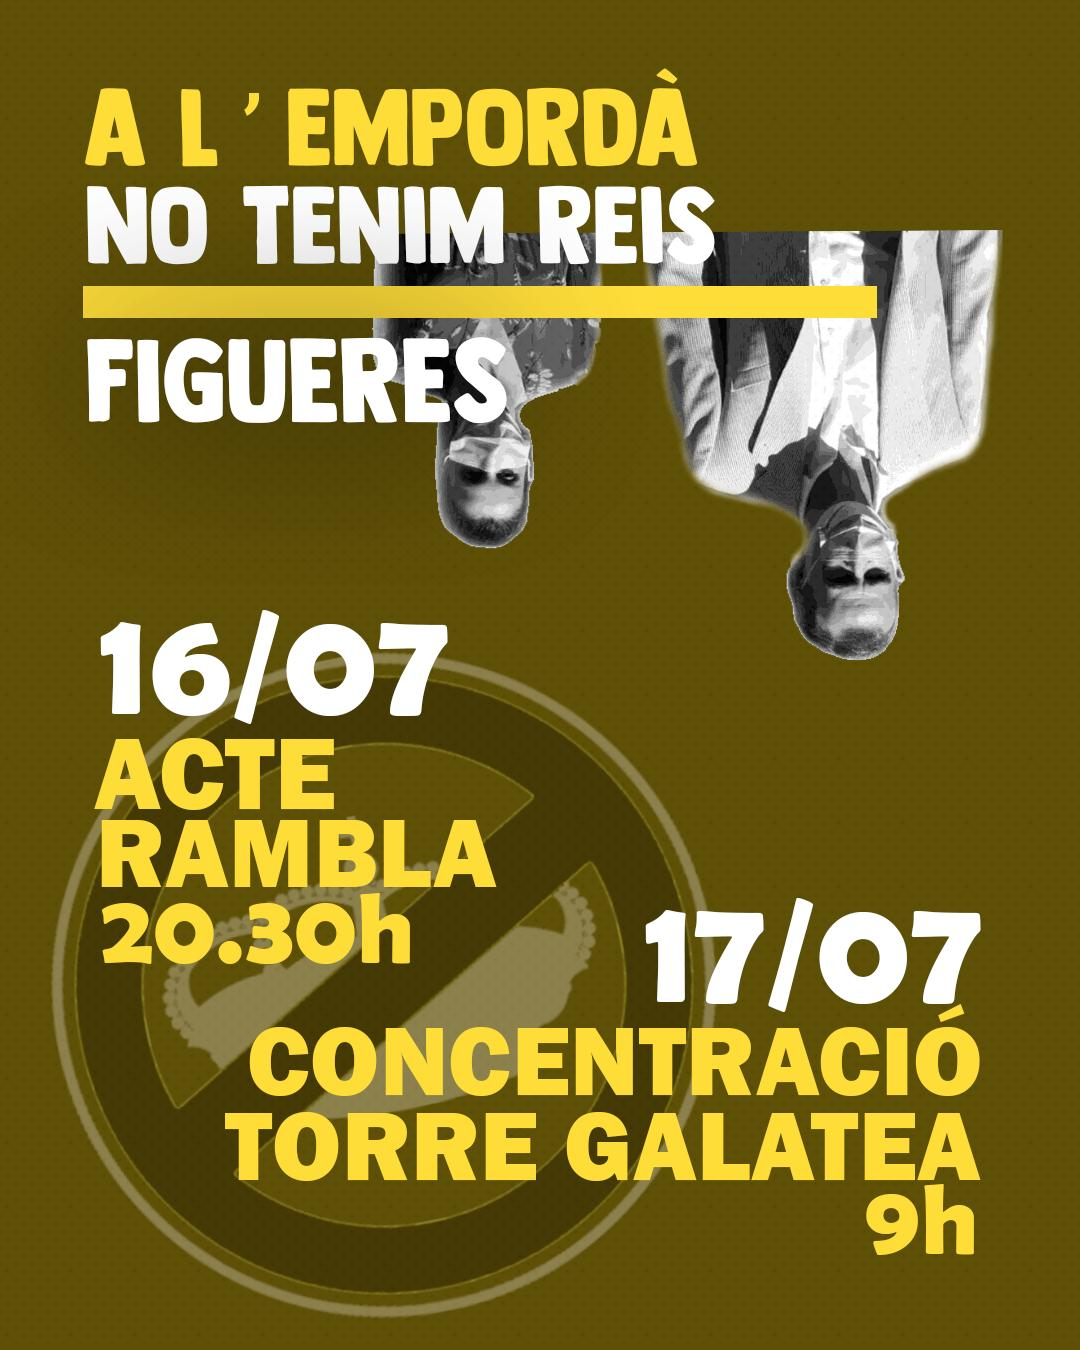 Concentracions en protesta de la visita dels Reis a Catalunya